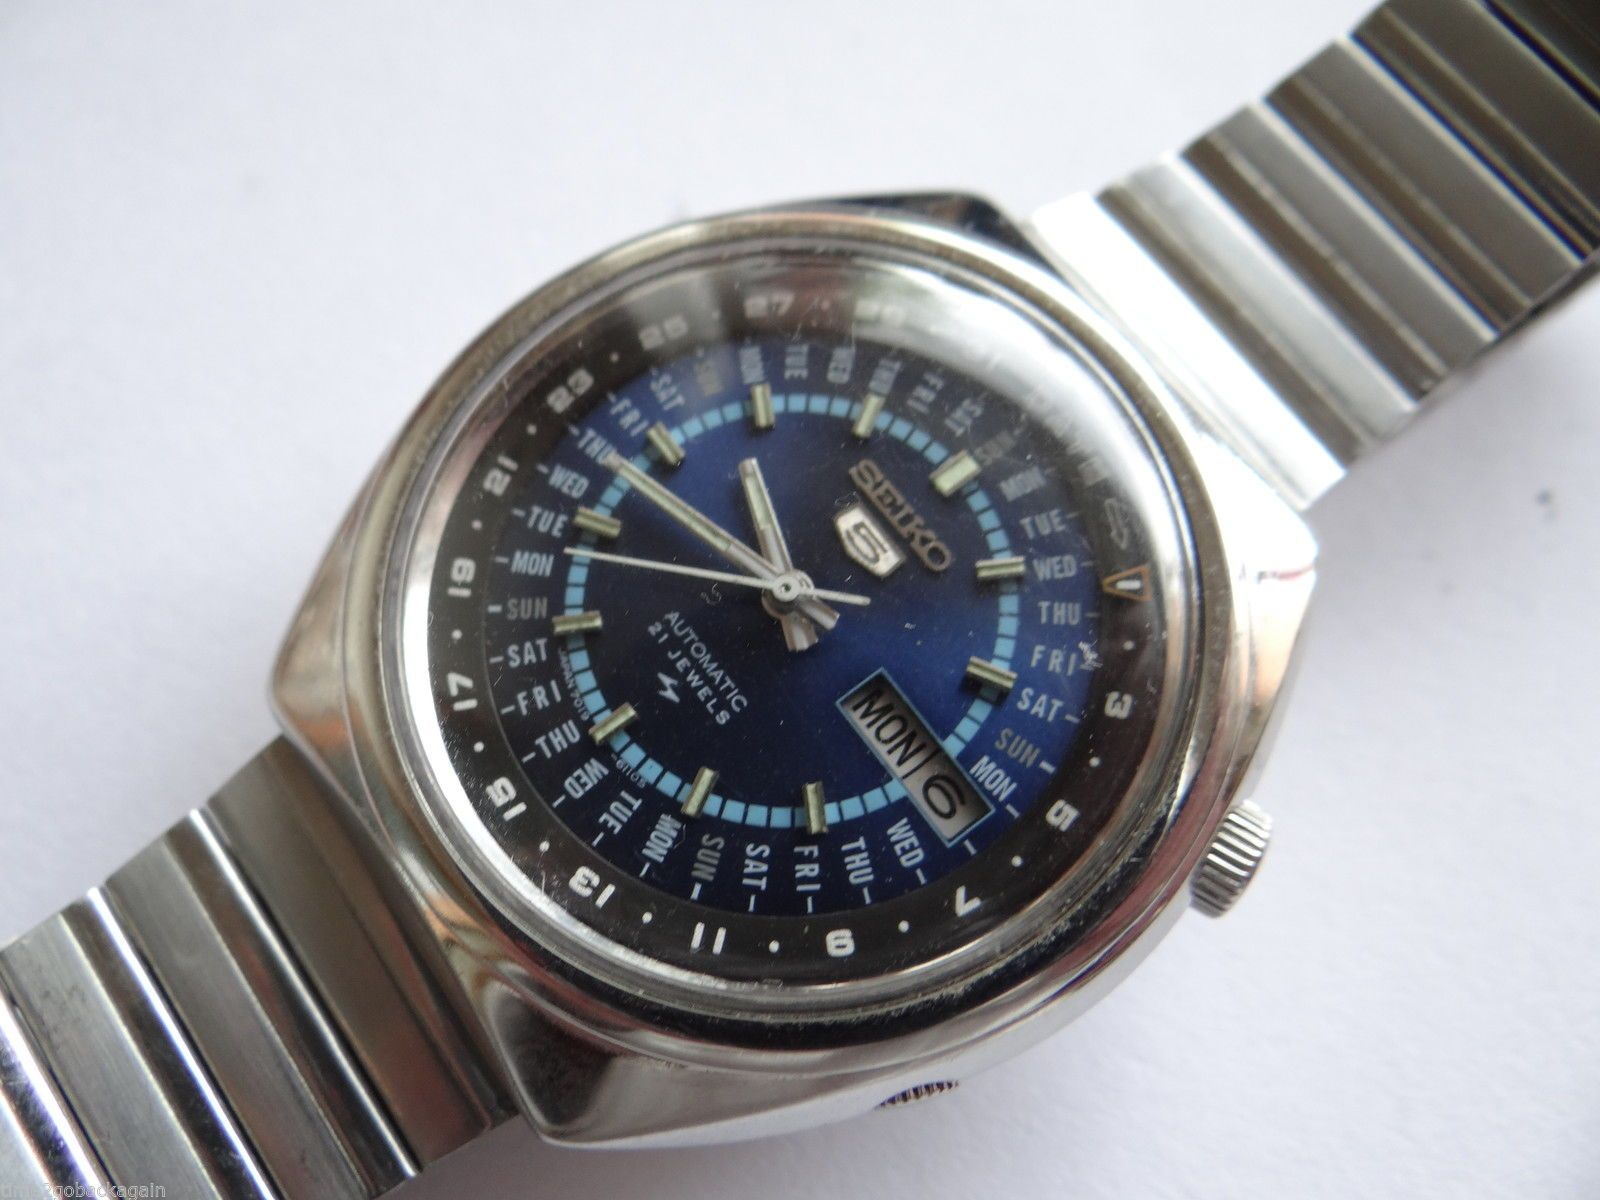 Rare Vintage Seiko 5 Perpetual Calendar Automatic Watch 7019 6070